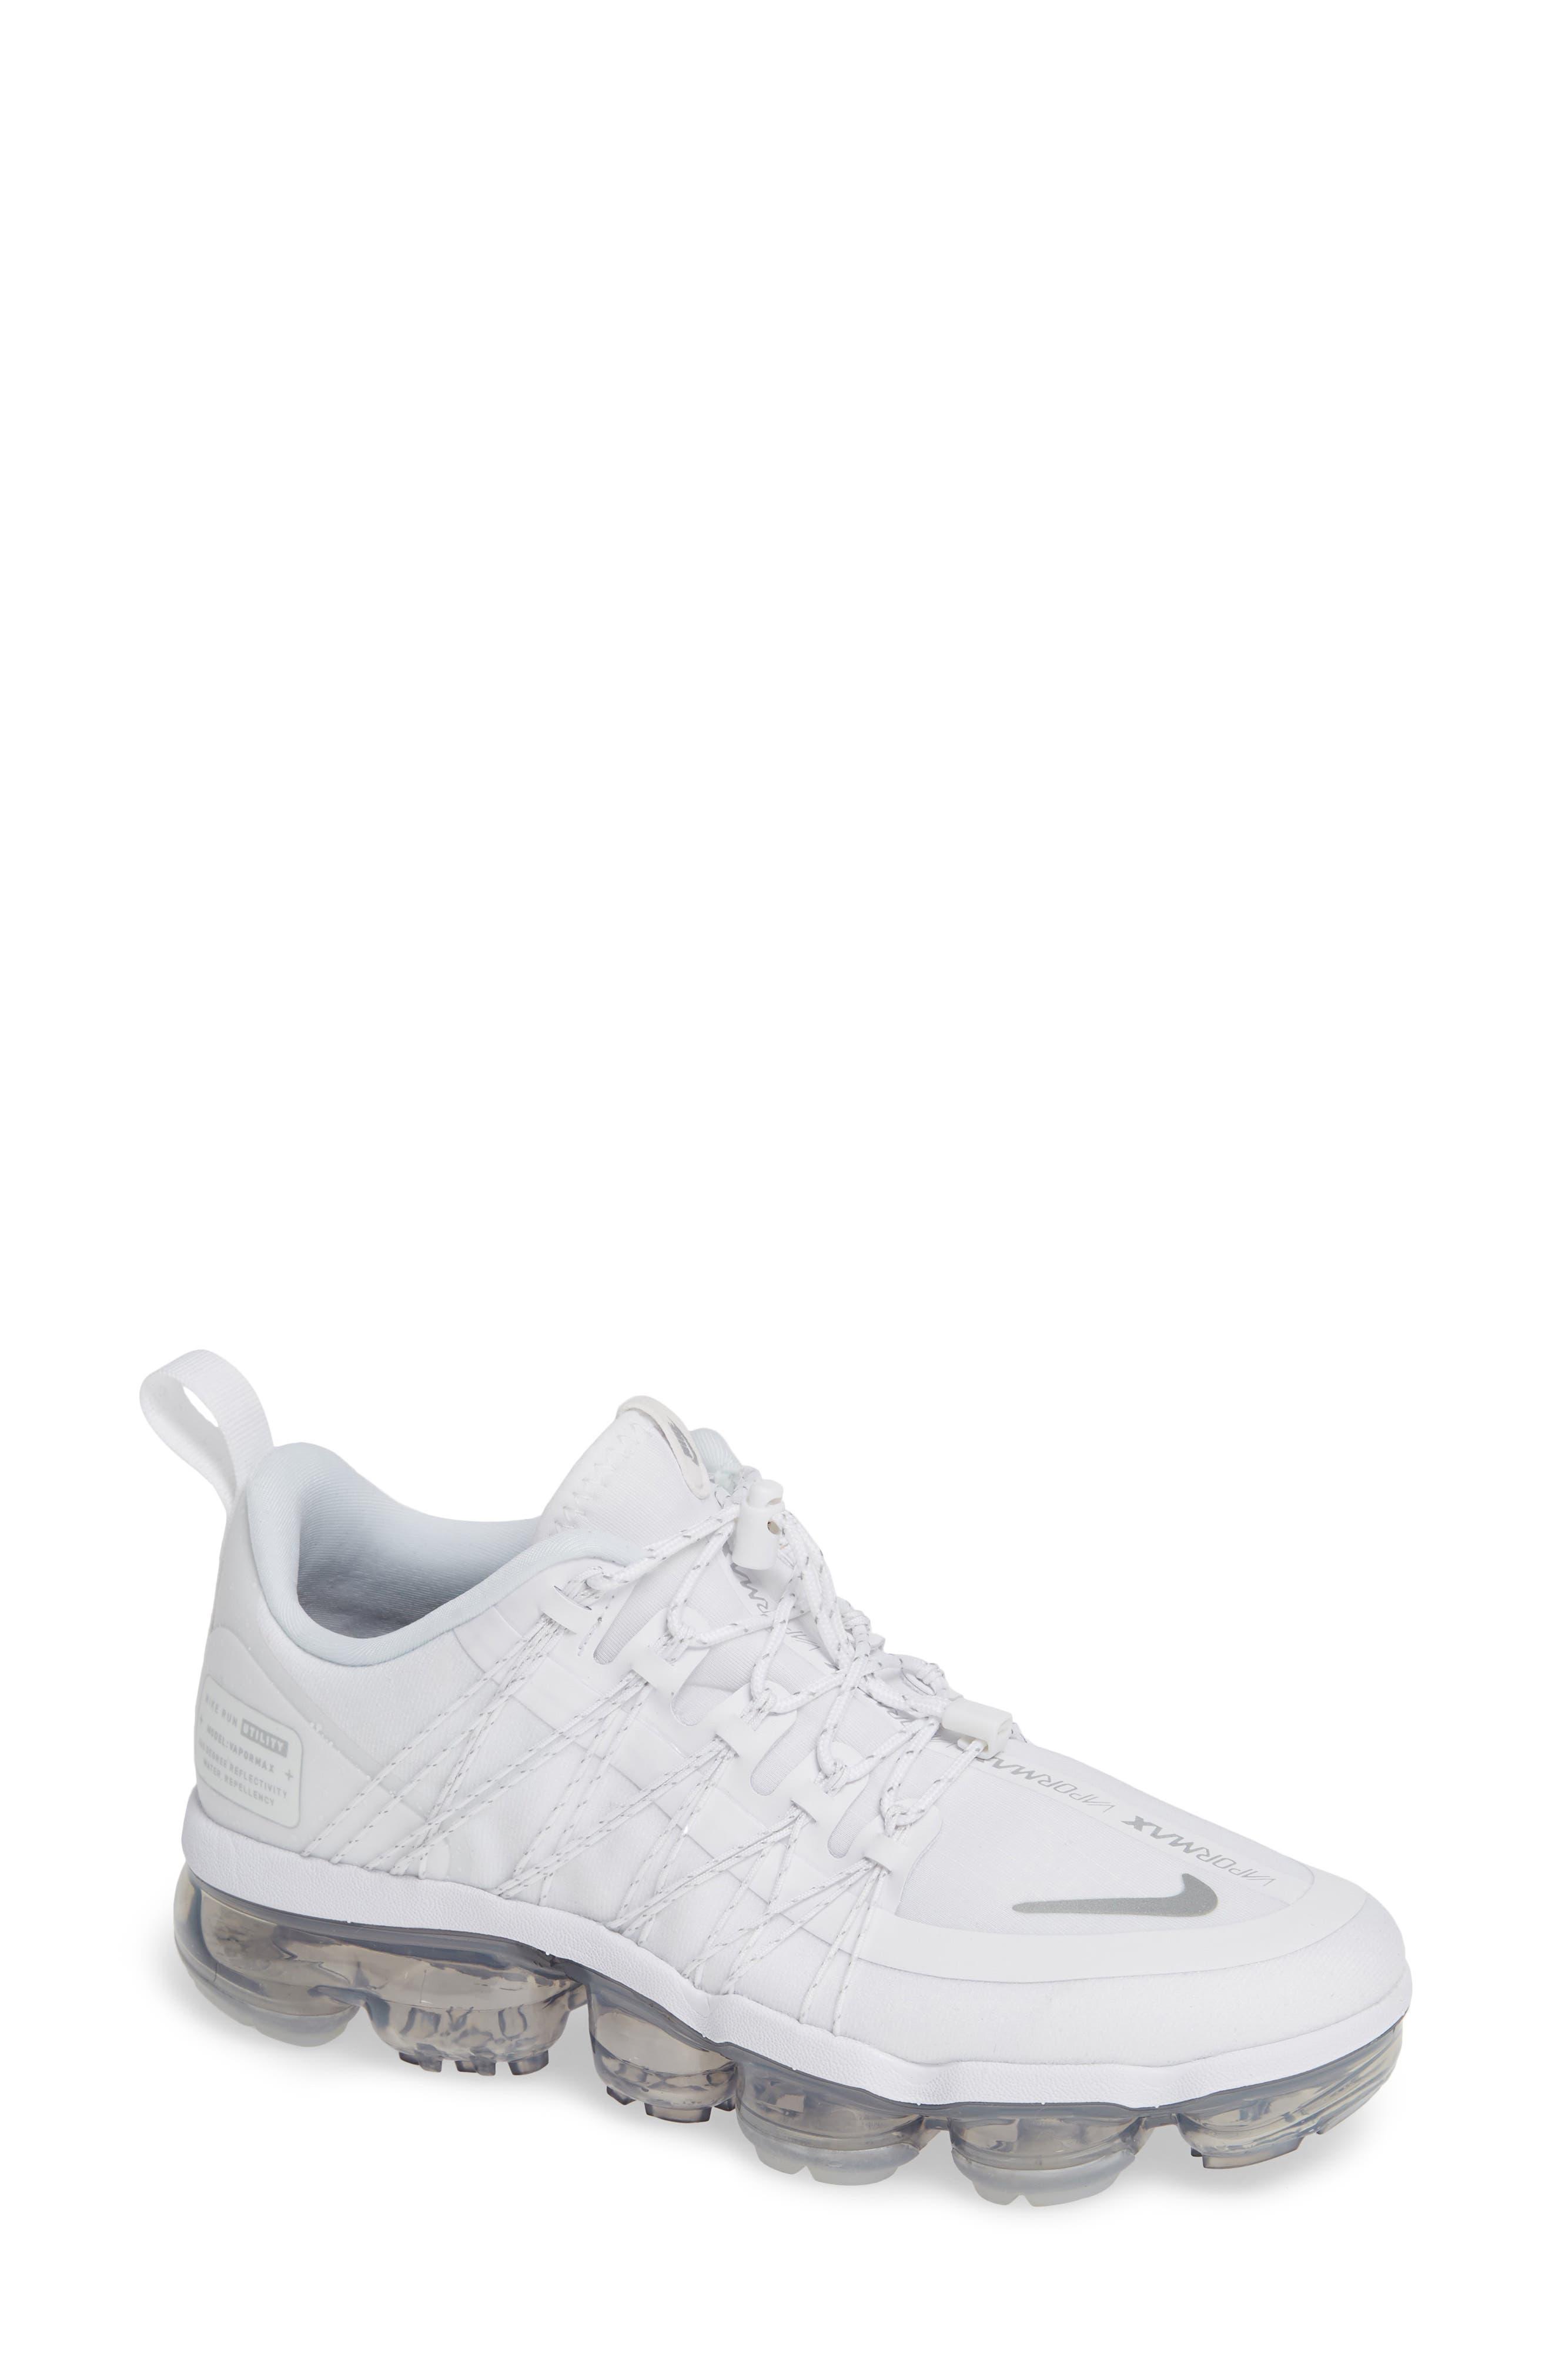 NIKE Air VaporMax Run Utility Sneaker, Main, color, WHITE/ REFLECT SILVER/ WHITE